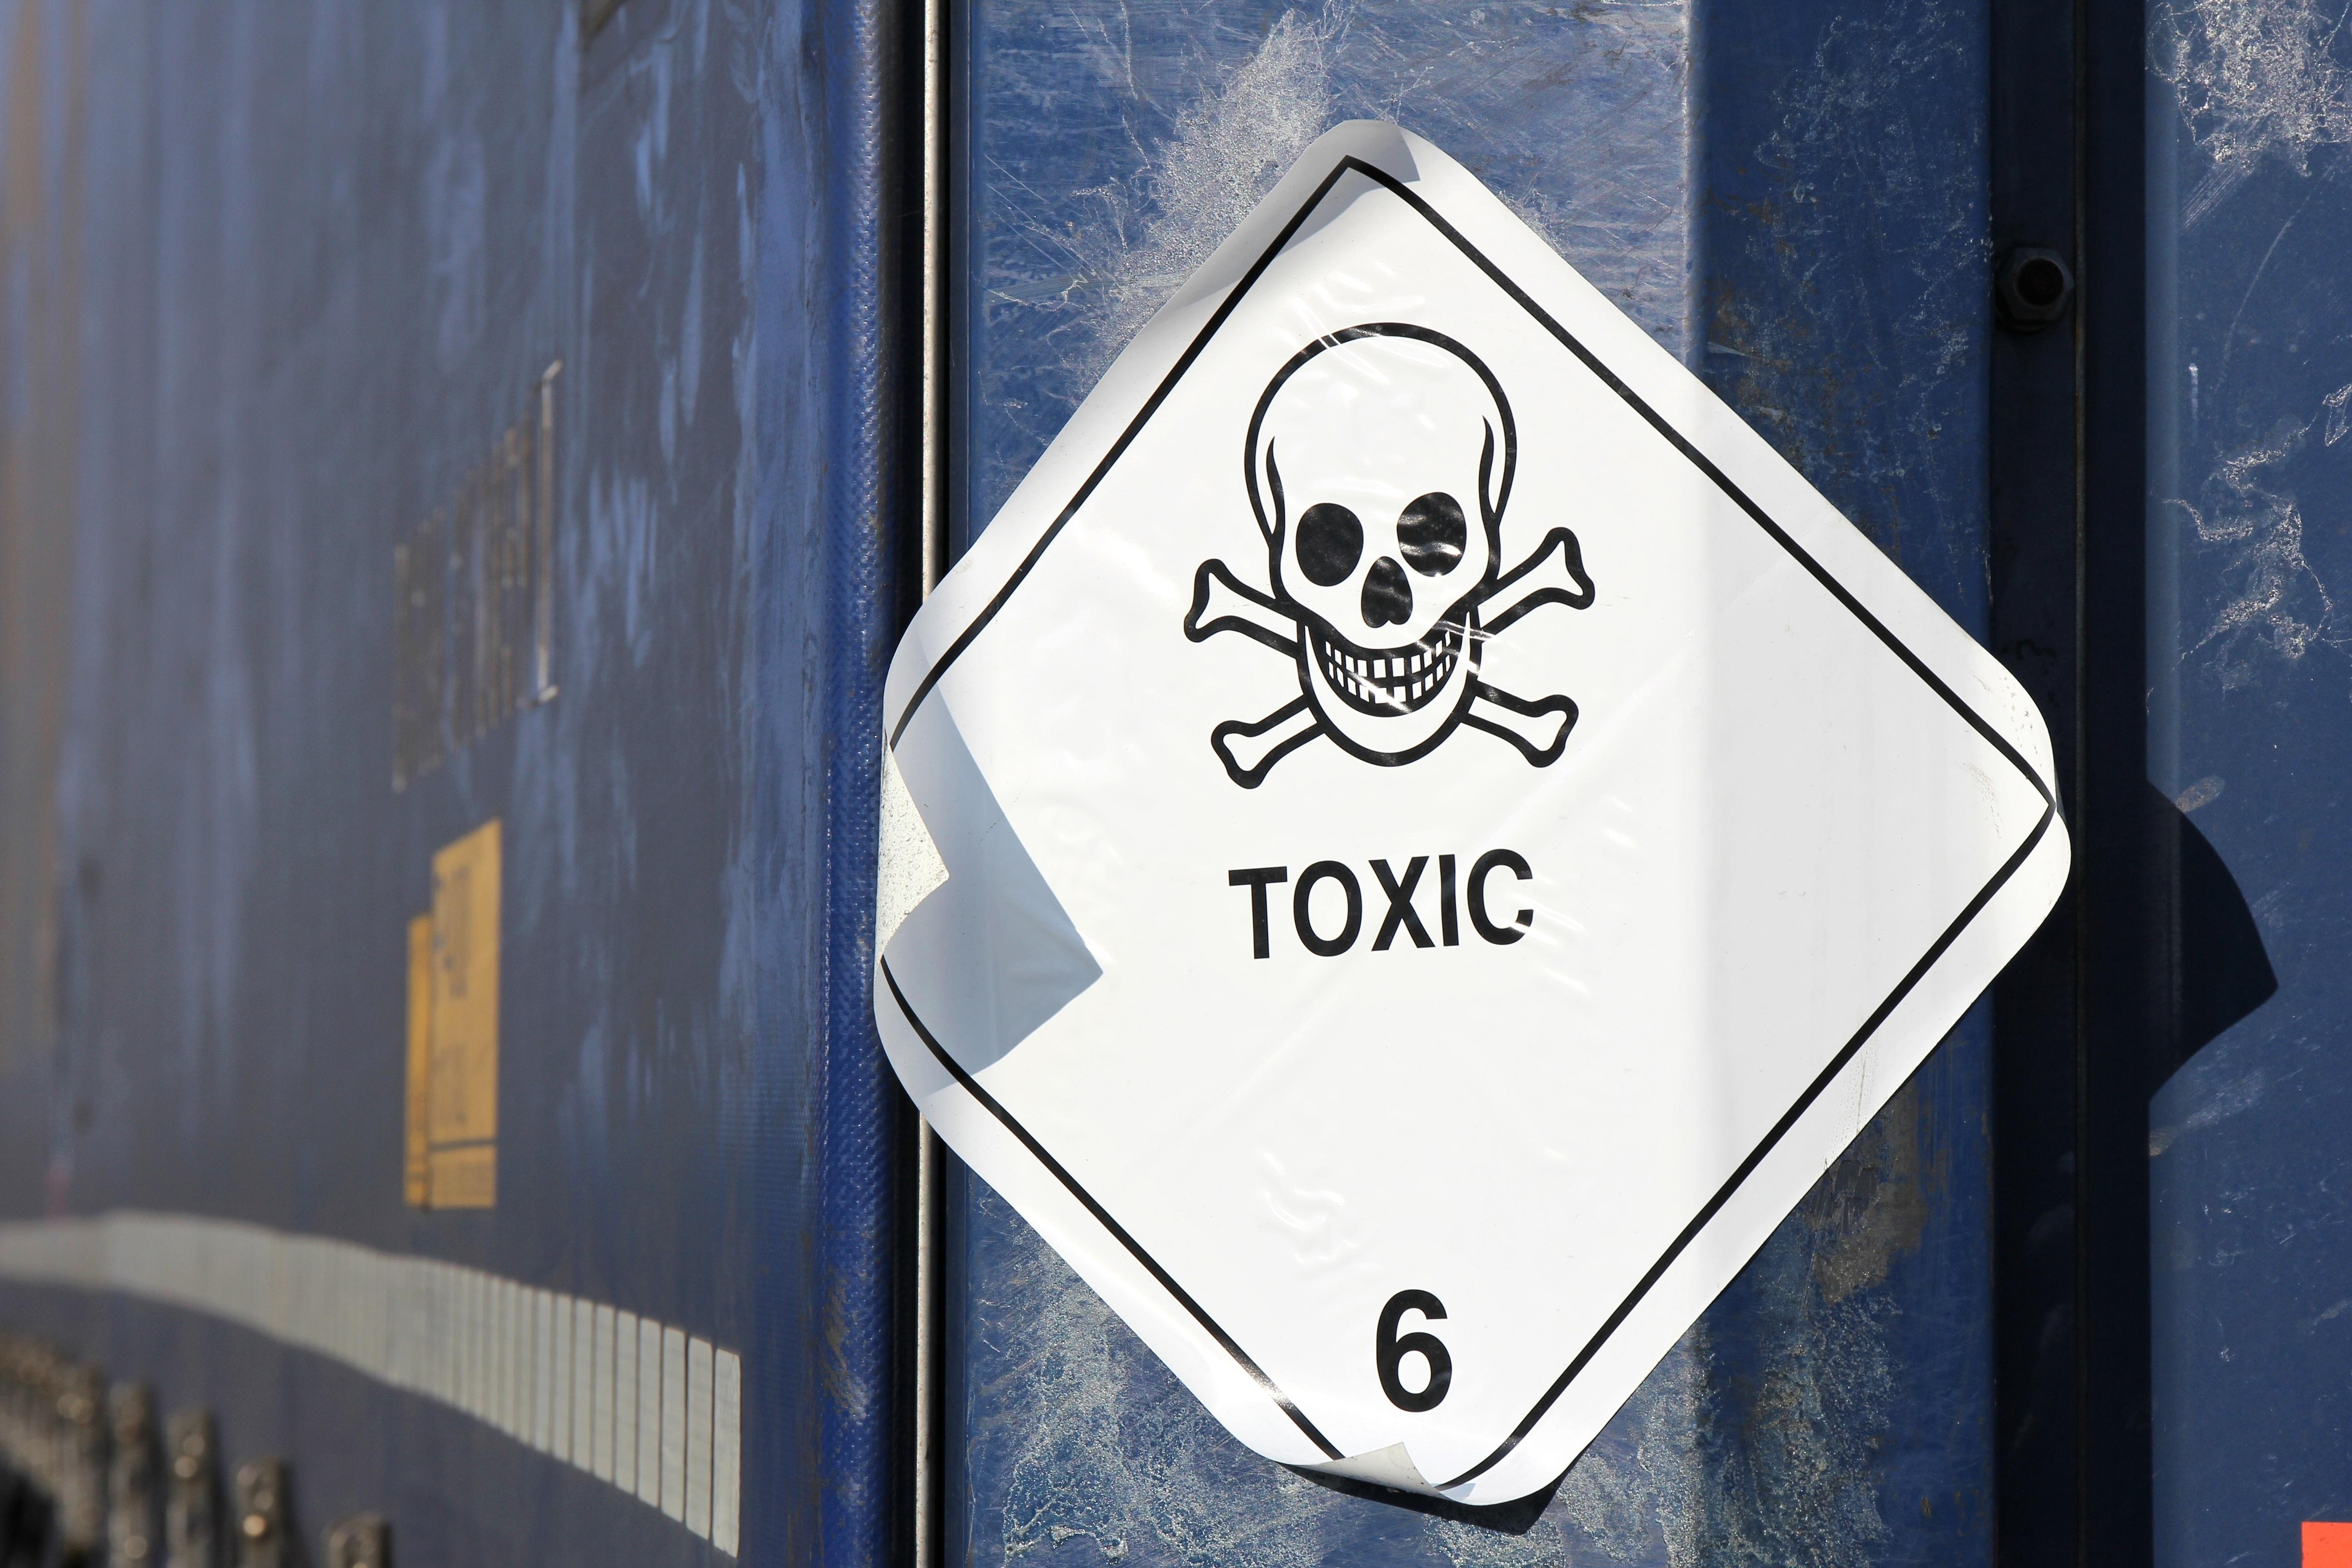 GHS pictogram for chemical hazard toxic substances